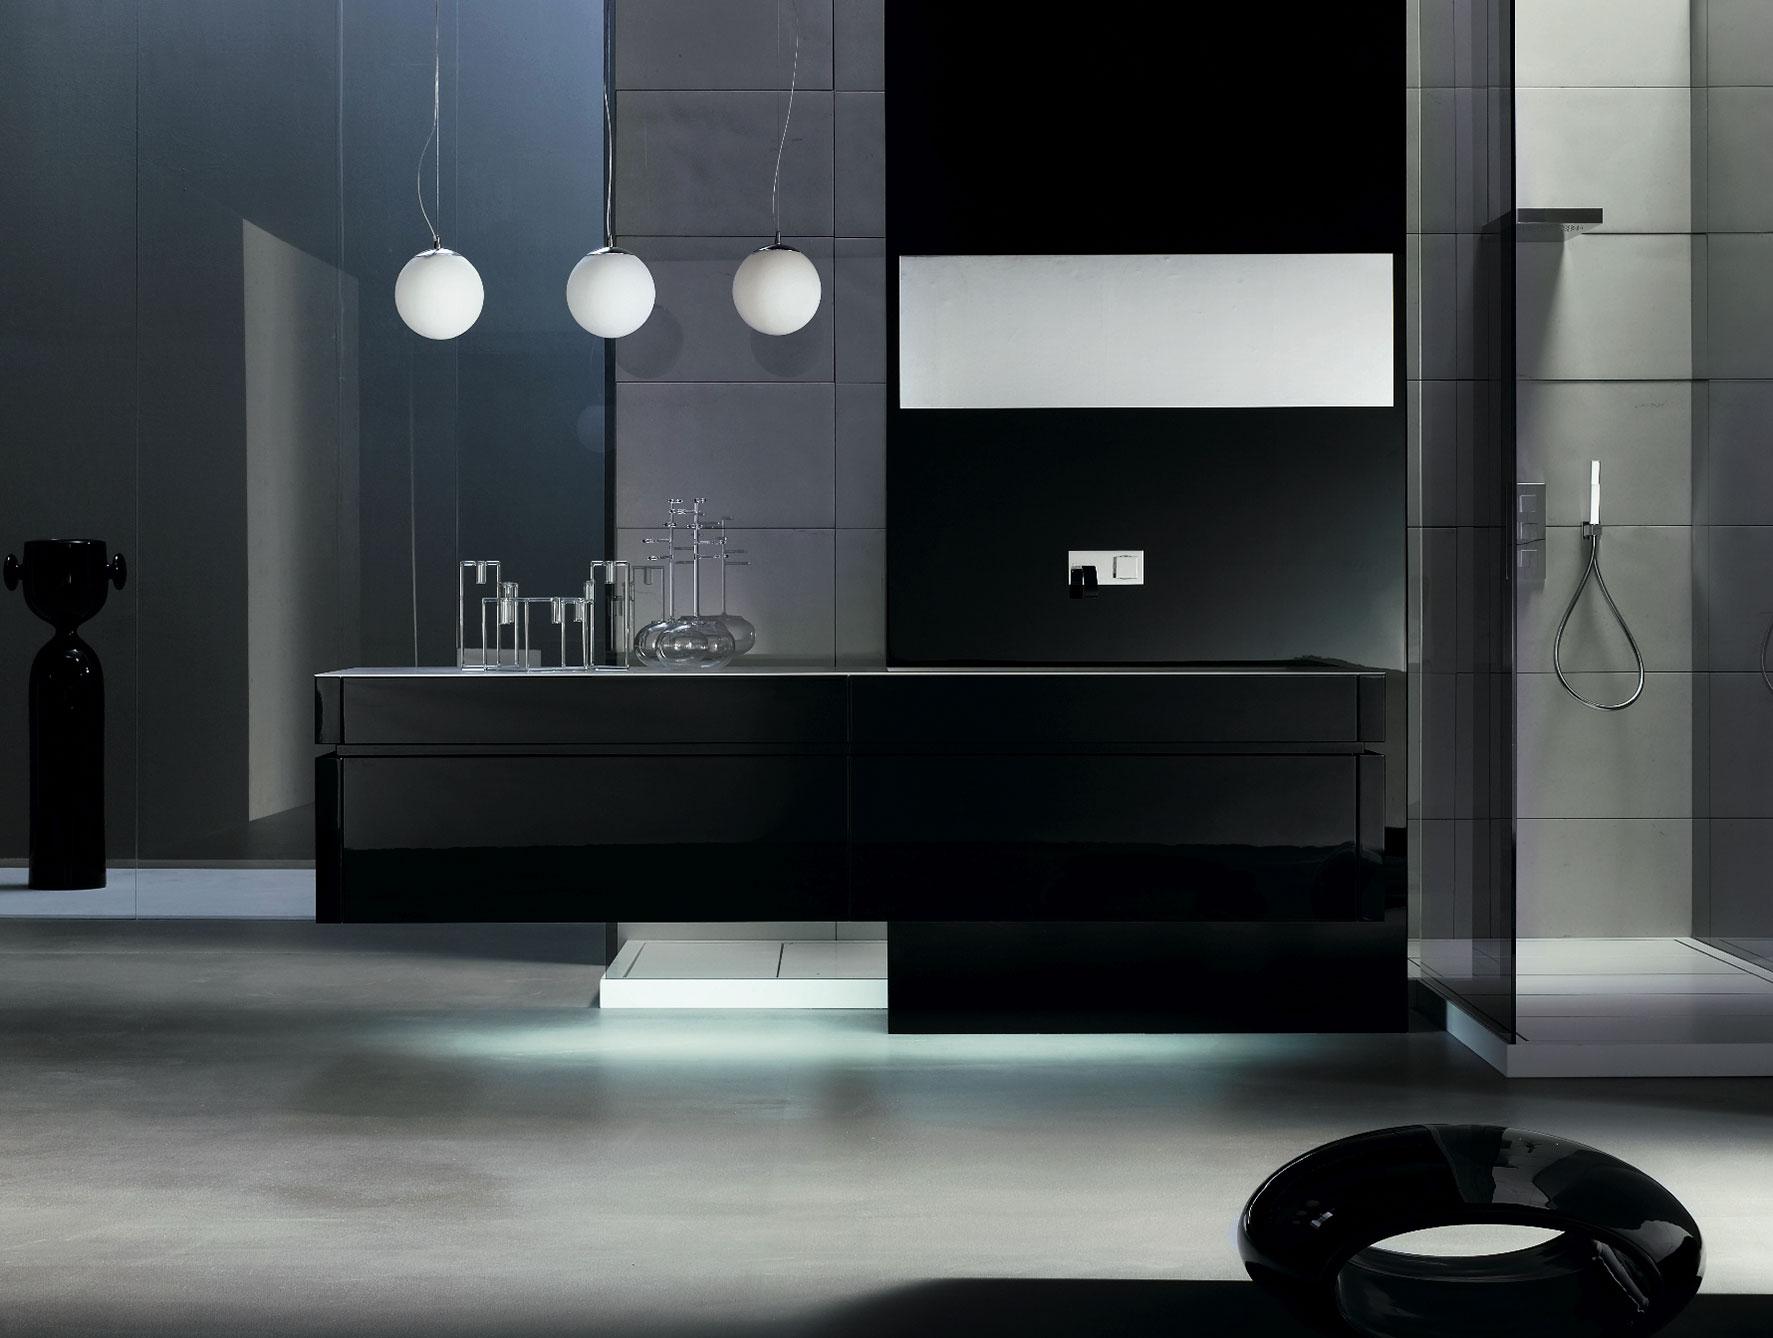 Italian Bathrooms Uk Best European Brands Online Store Luxurybathroombrandsuk Bathroom Design Luxury Modern Bathrooms Interior Tiny House Bathroom